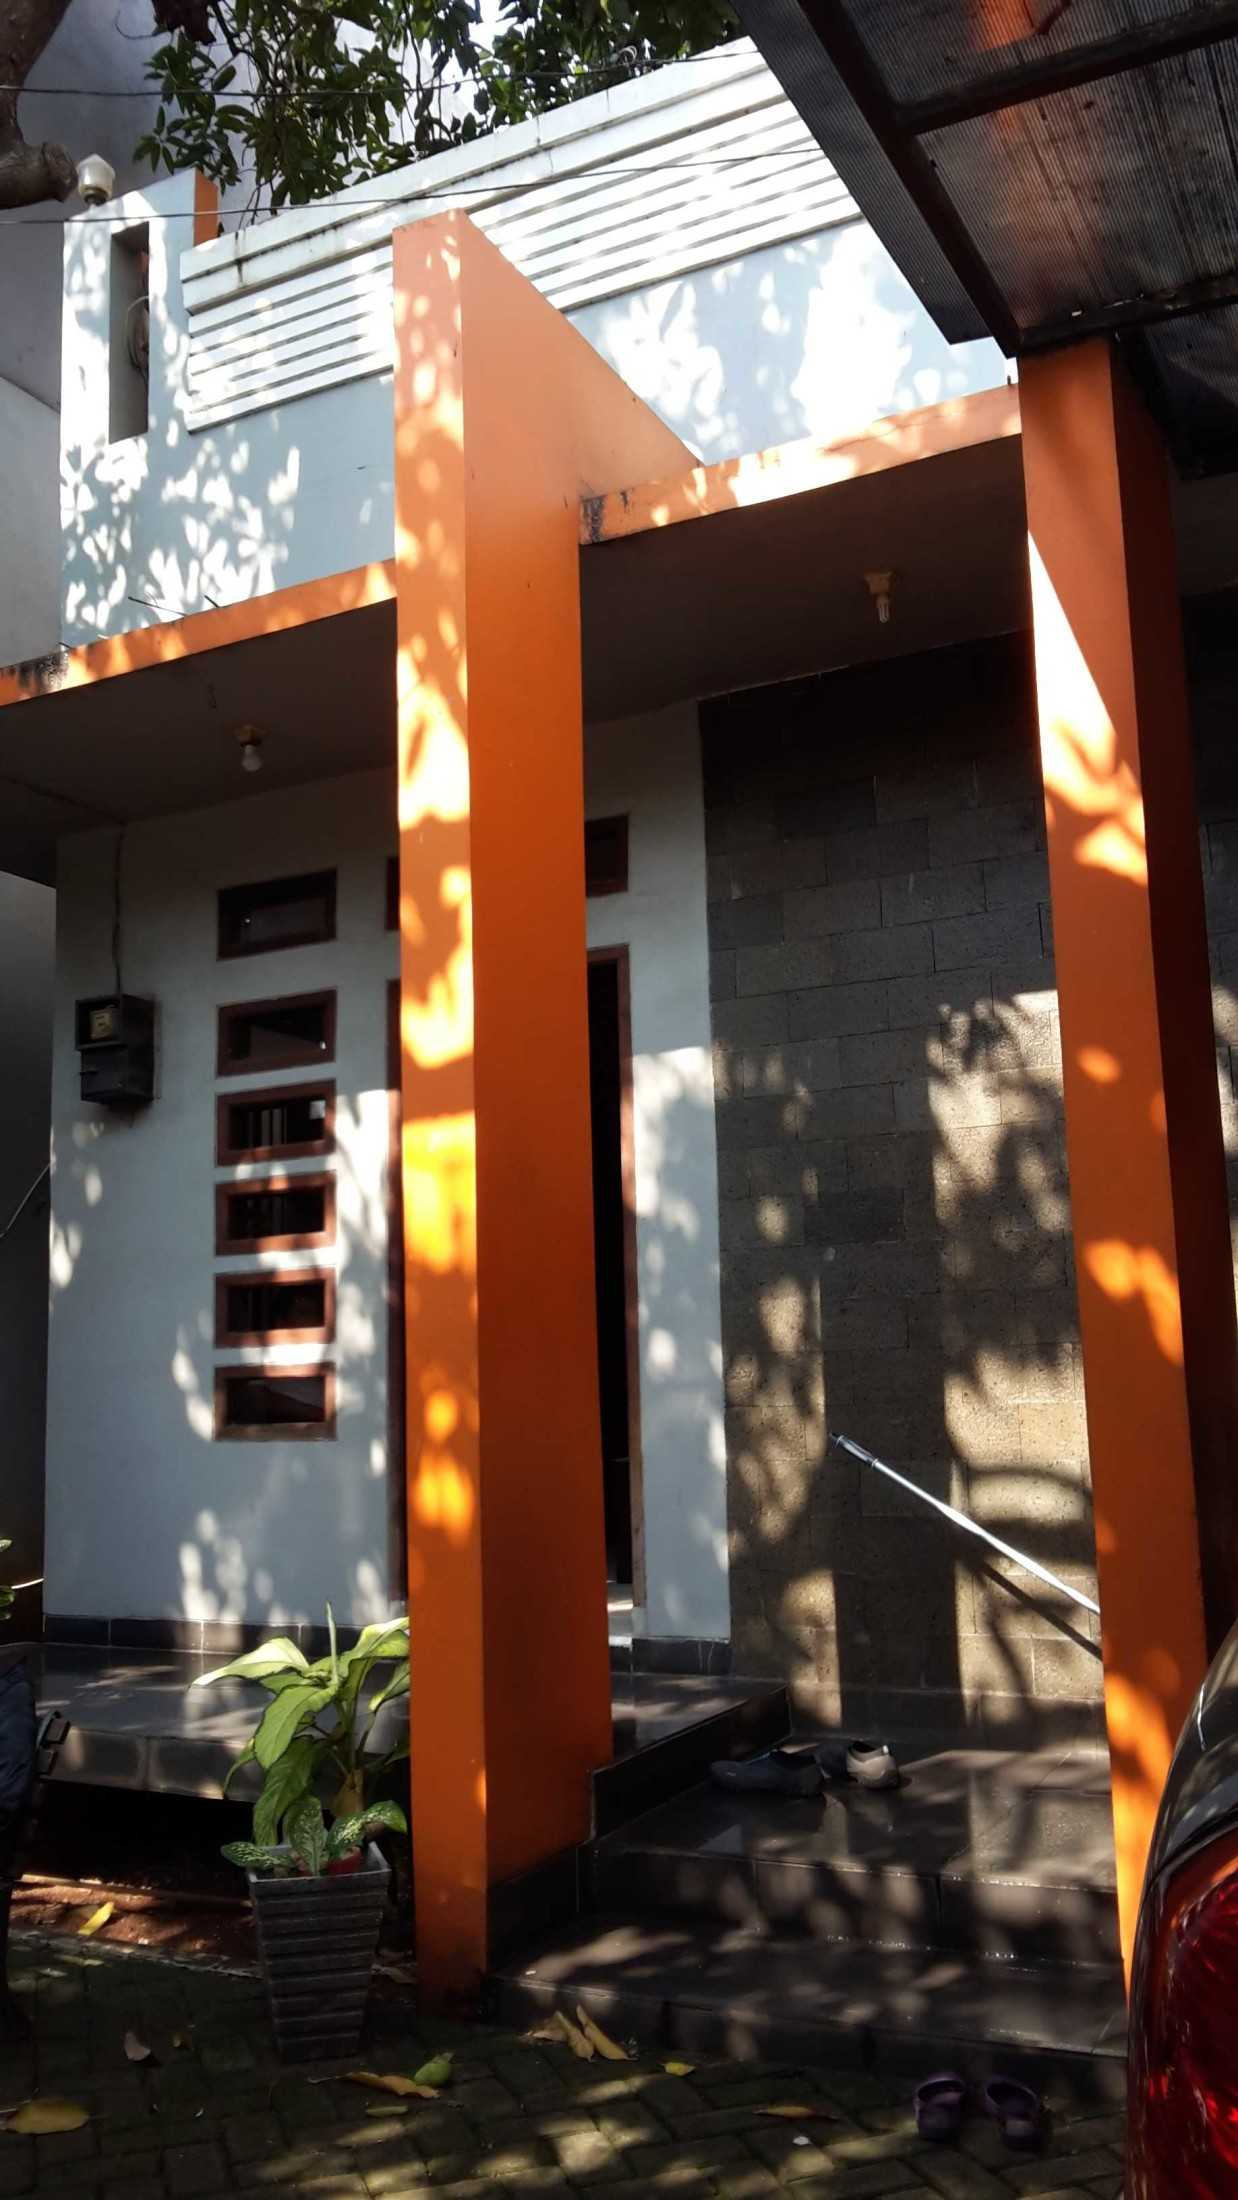 Ideall Design Renovasi Rumah Roof Top Box Rawabadak Utara, Kec. Koja, Kota Jkt Utara, Daerah Khusus Ibukota Jakarta, Indonesia Rawabadak Utara, Kec. Koja, Kota Jkt Utara, Daerah Khusus Ibukota Jakarta, Indonesia Ideall-Design-When-A-Design-Idea-Becomes-Ideal-Design-For-All-Rumah-Box-Rawabadak  113743